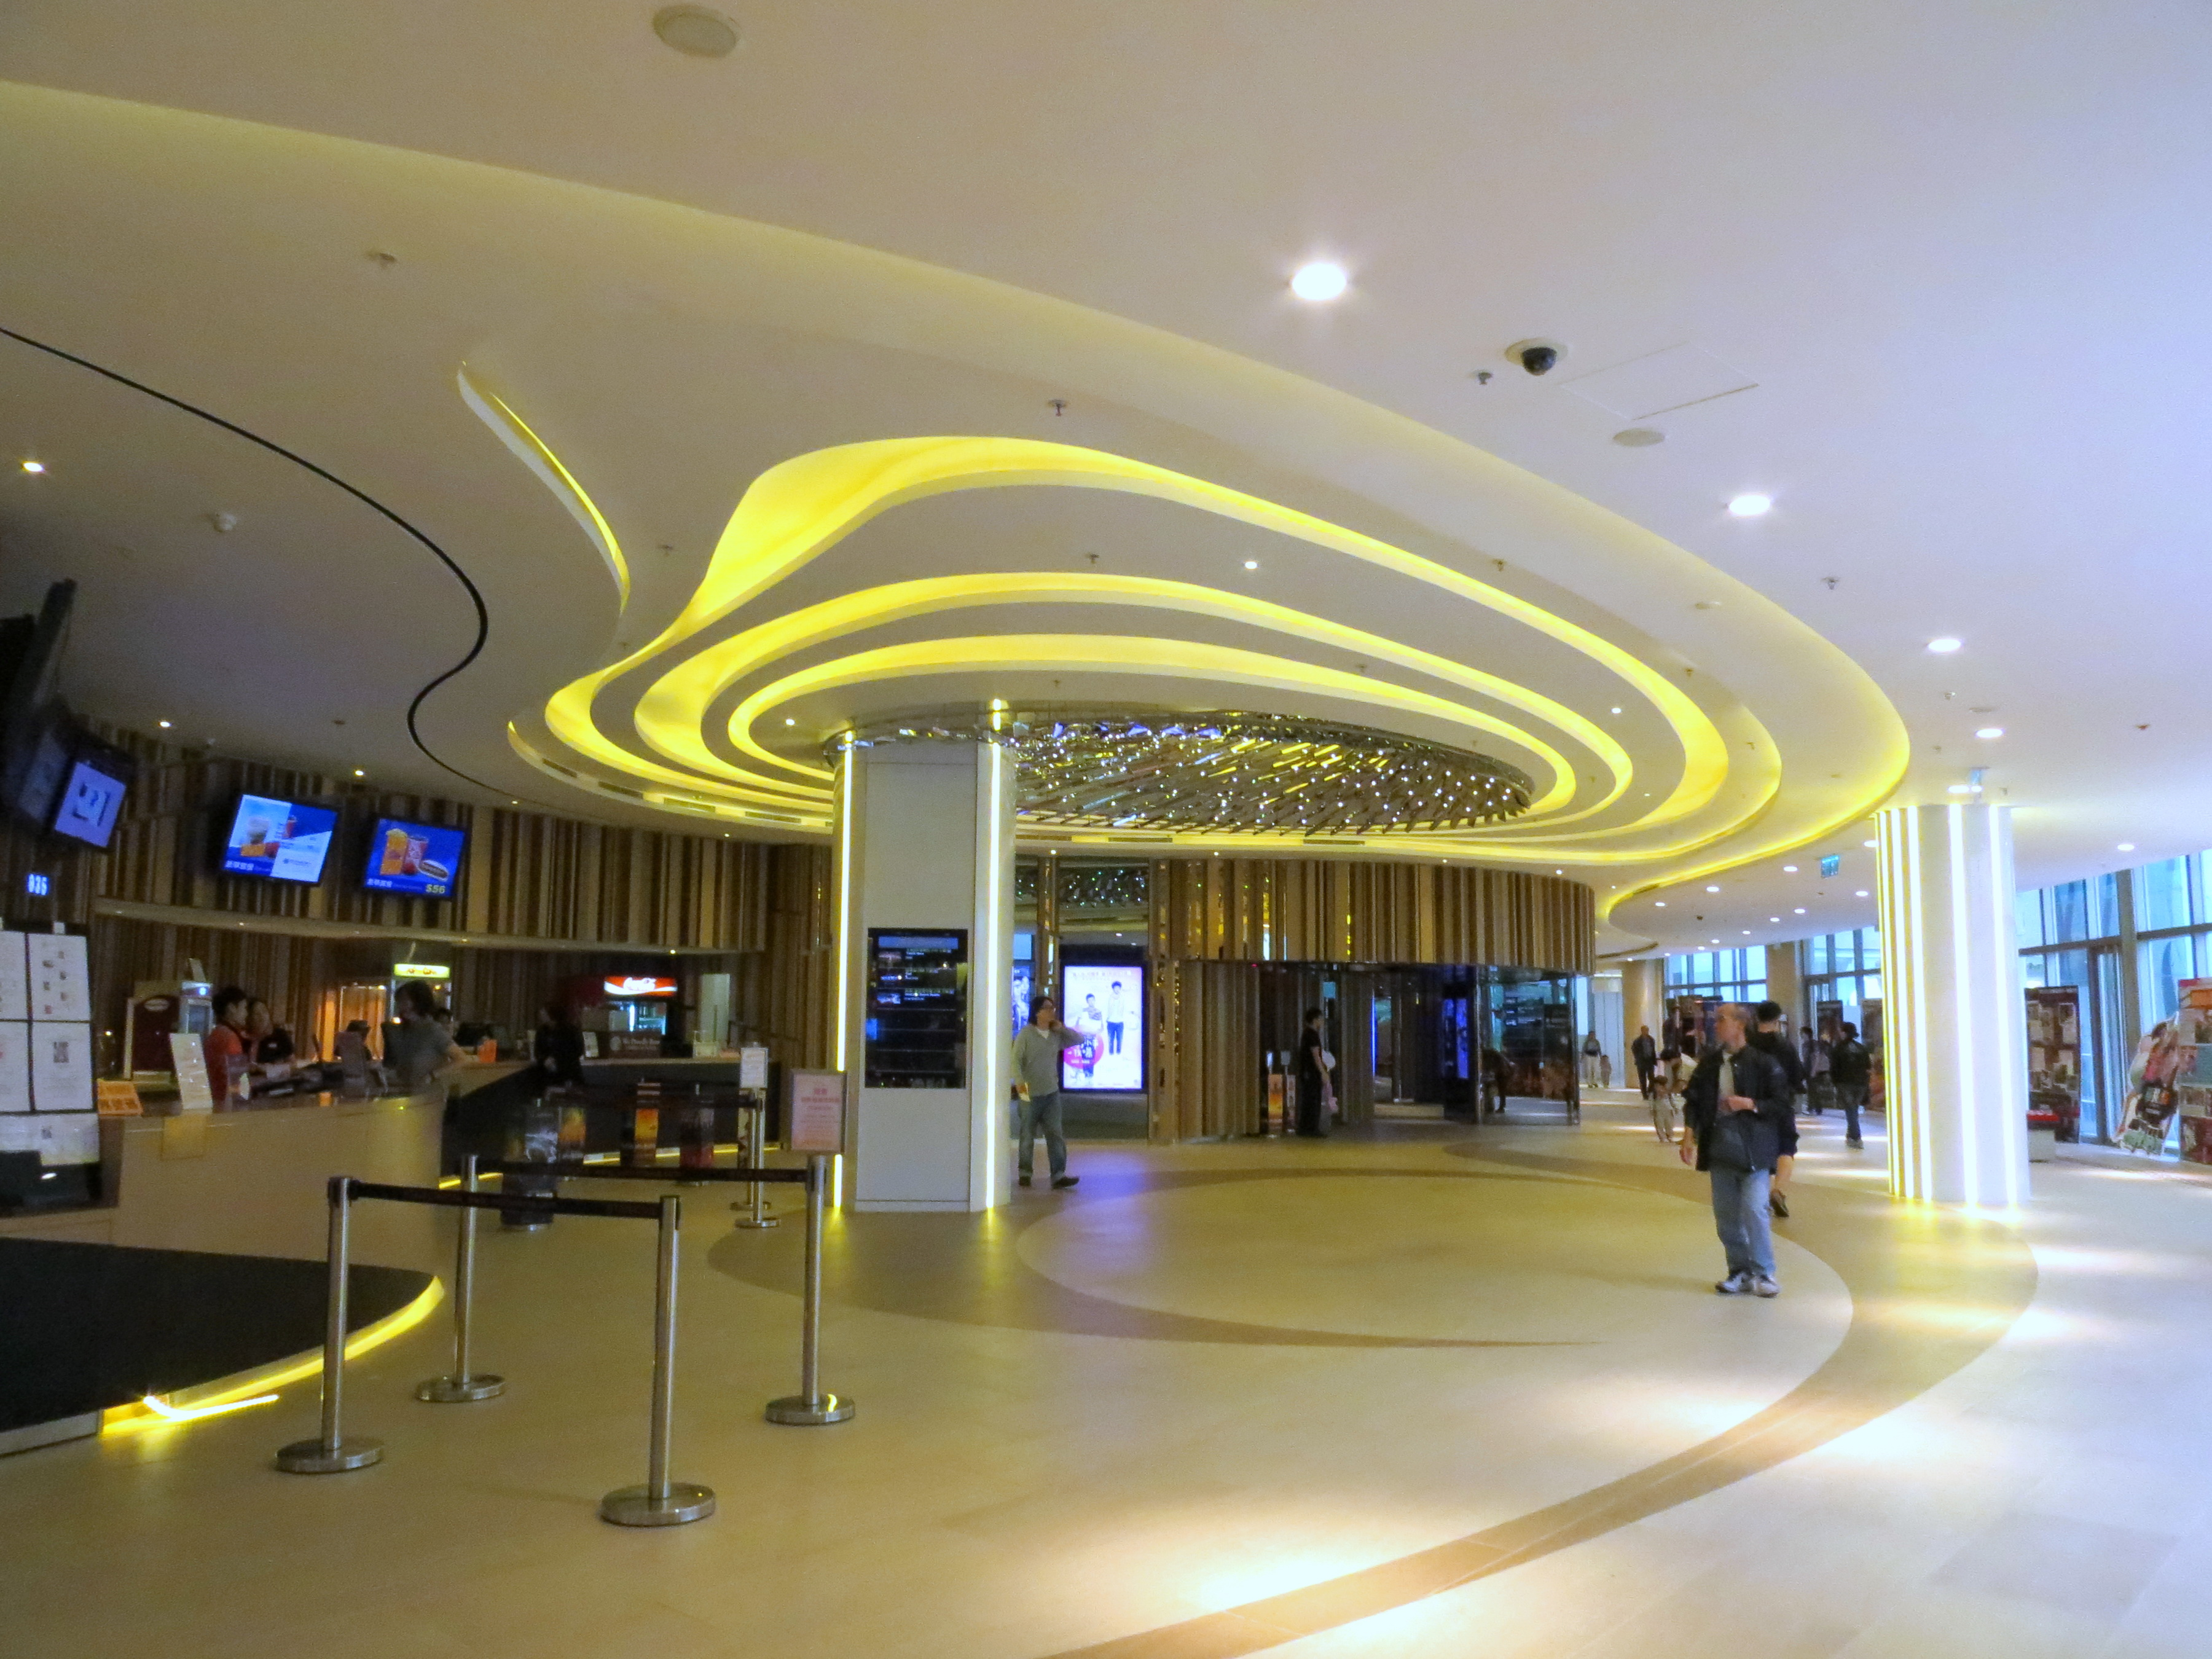 filestar cinema popcorn hong kongjpg wikipedia